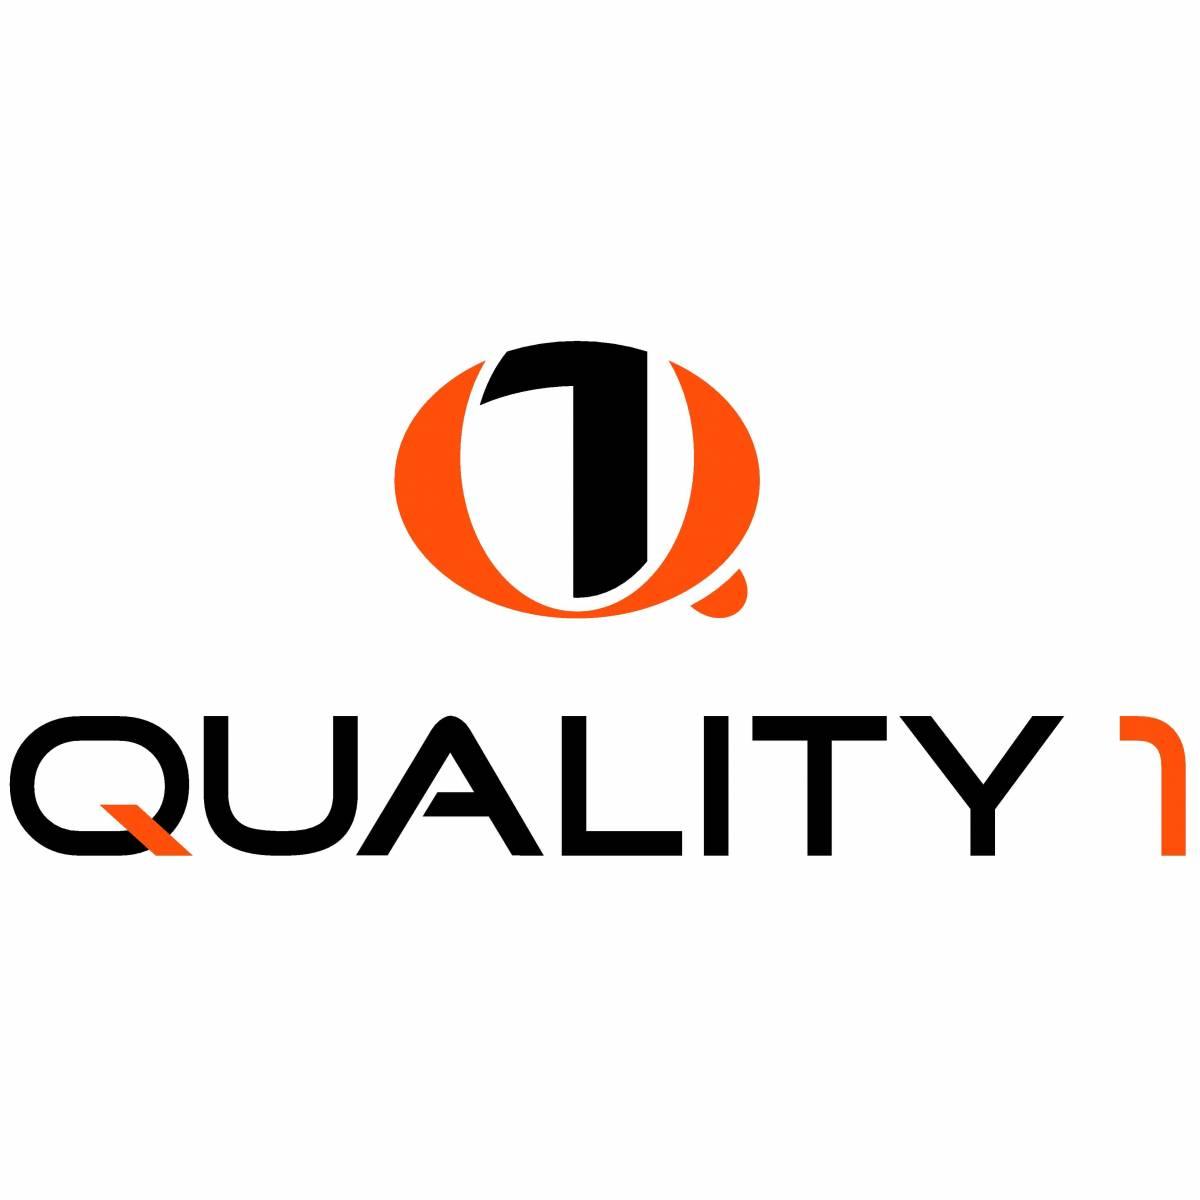 n3447 quality 1 ag kooperiert mit plusdrive 1